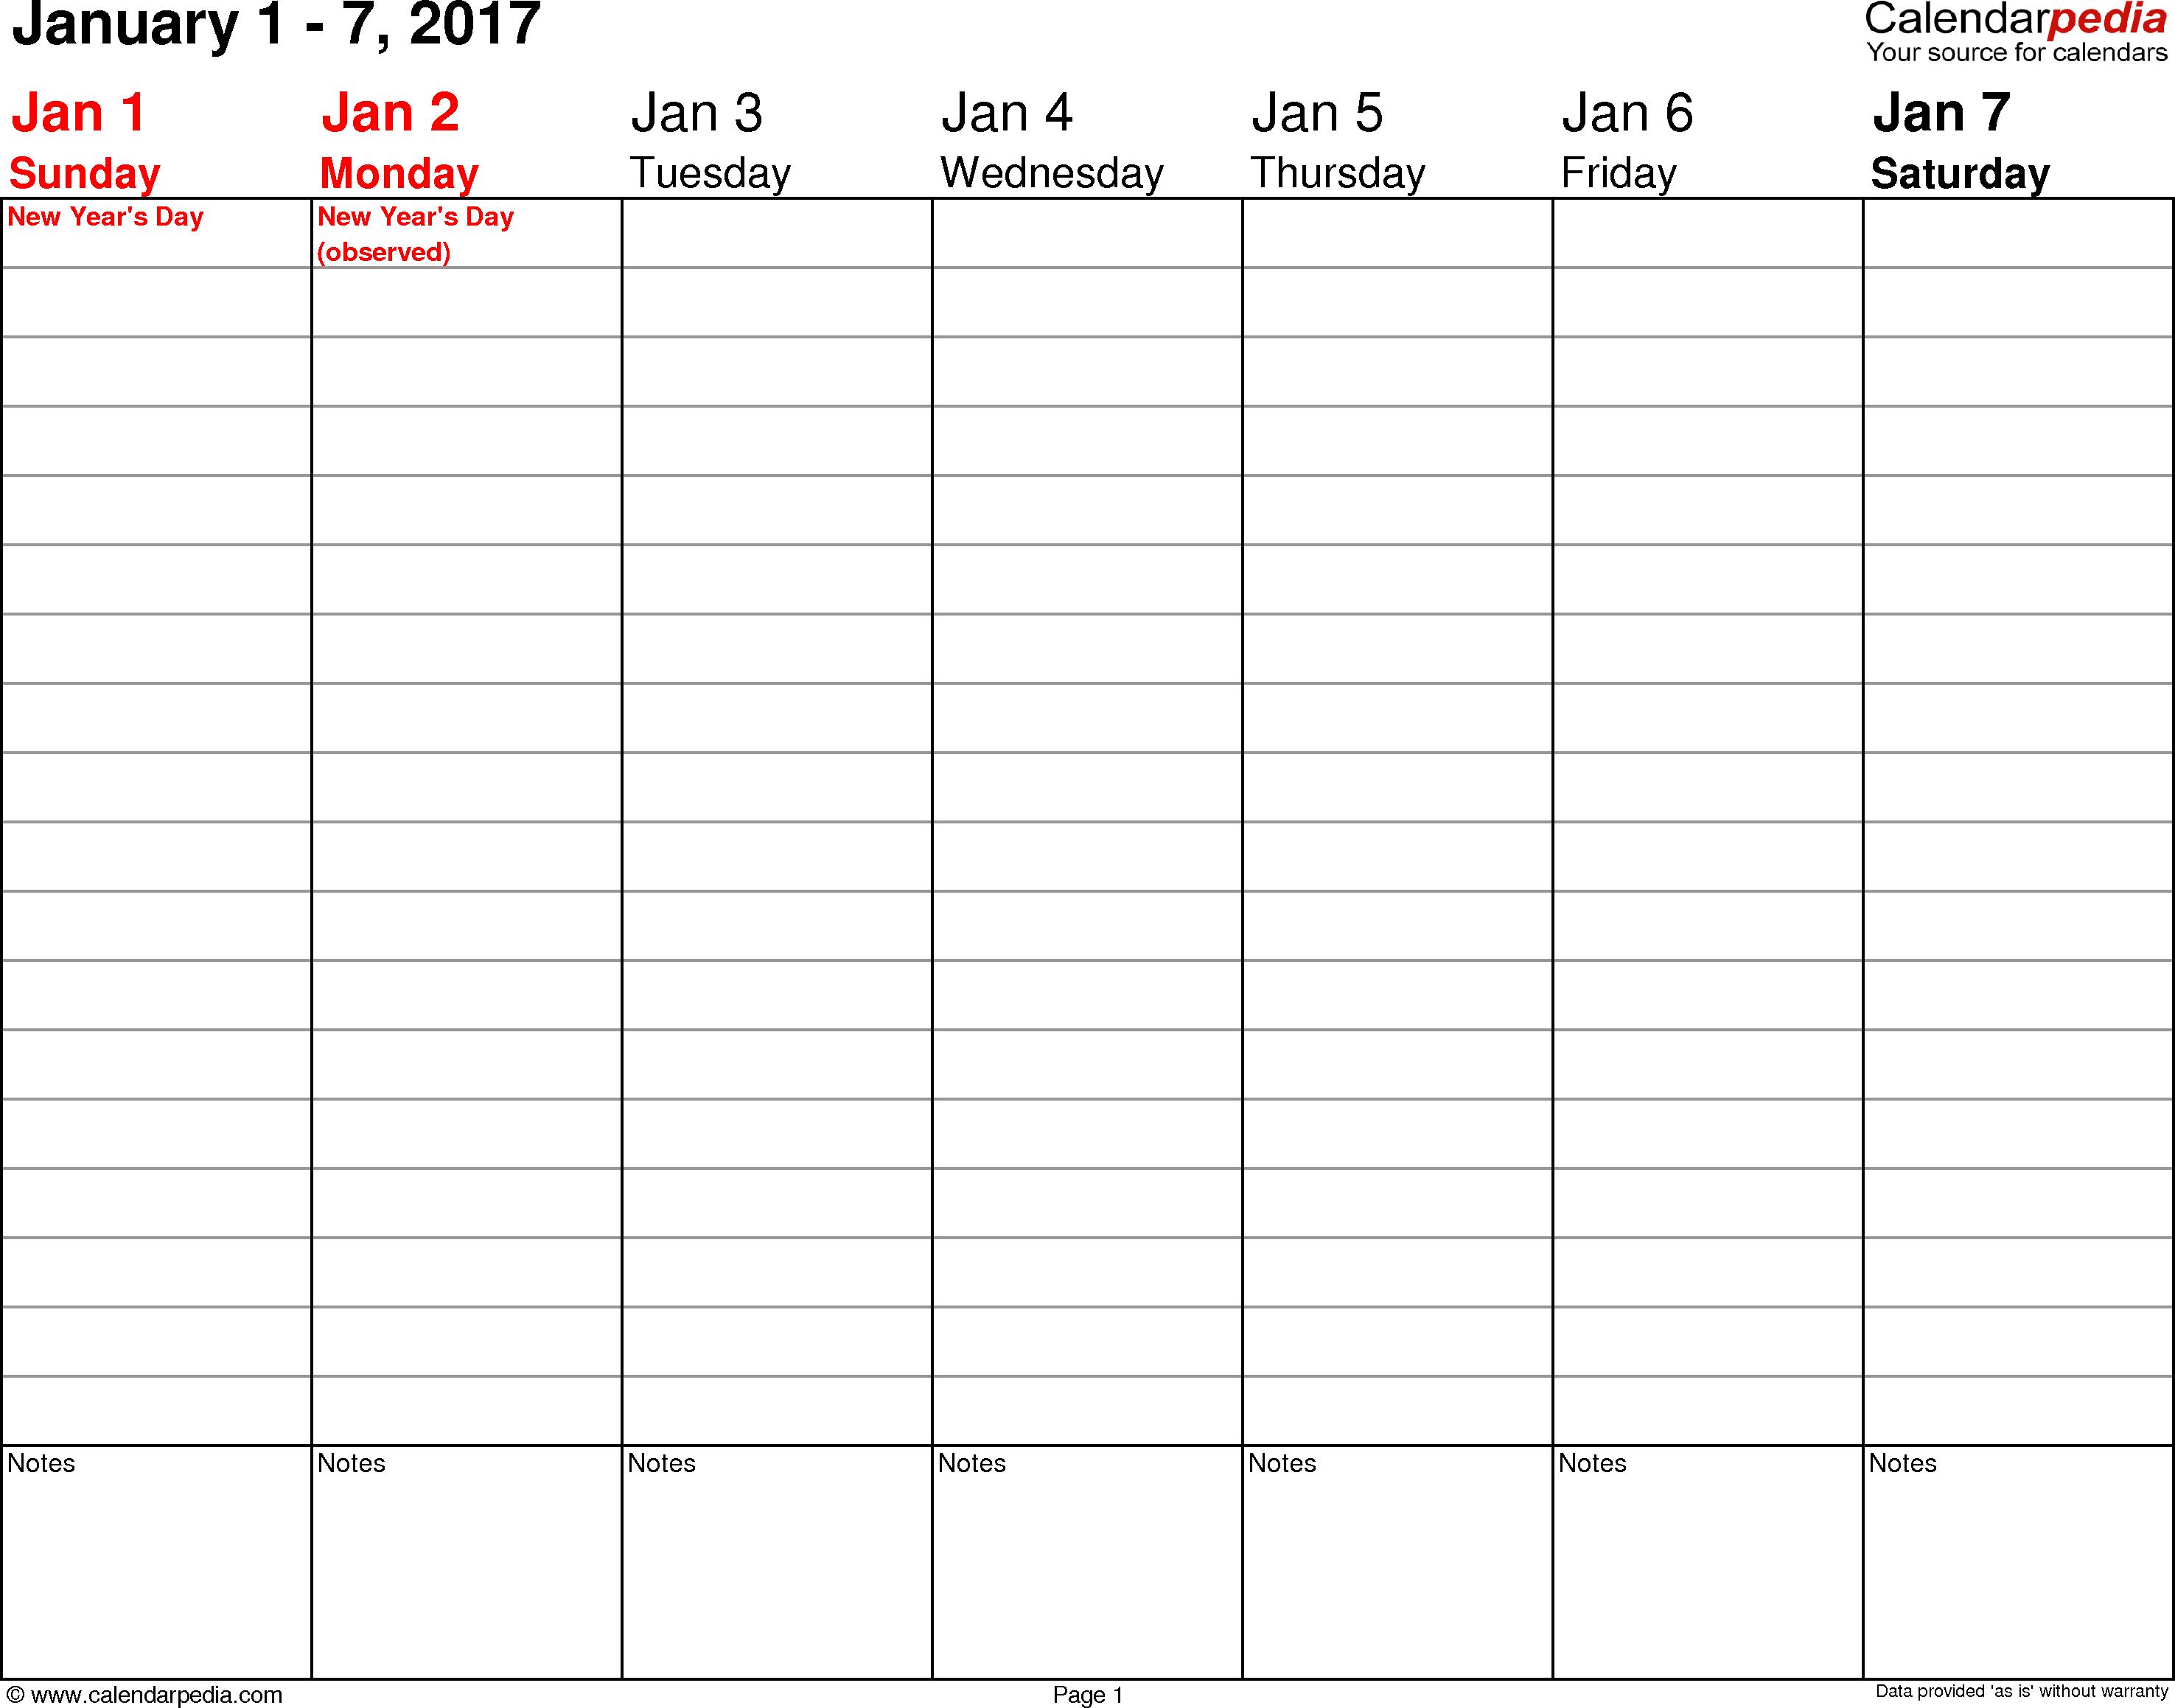 Weekly Calendar 2017 For Word - 12 Free Printable Templates - Free Printable Weekly Planner 2017